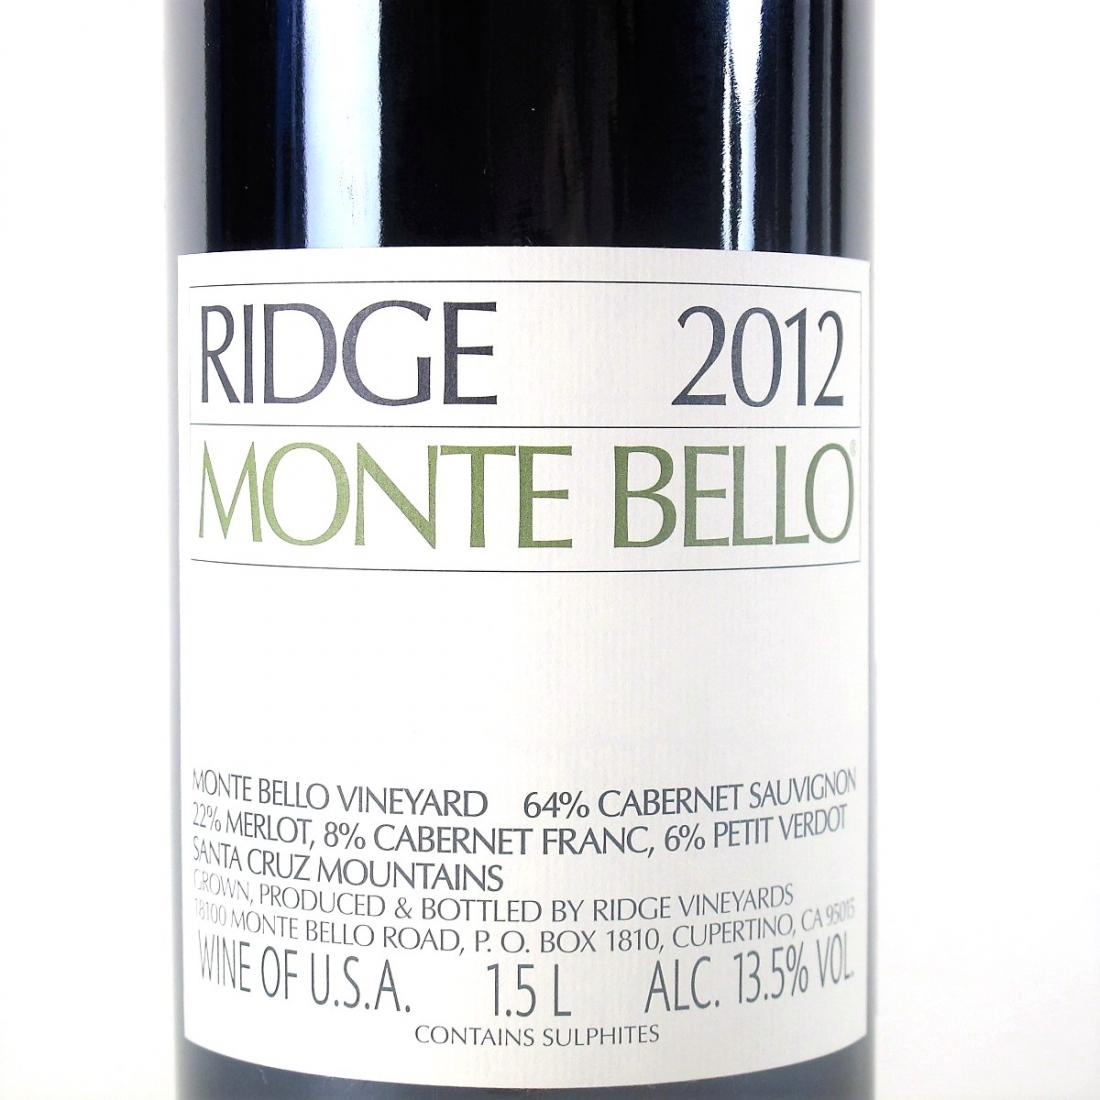 Ridge Monte Bello 2012 Santa Cruz Mountains 150cl